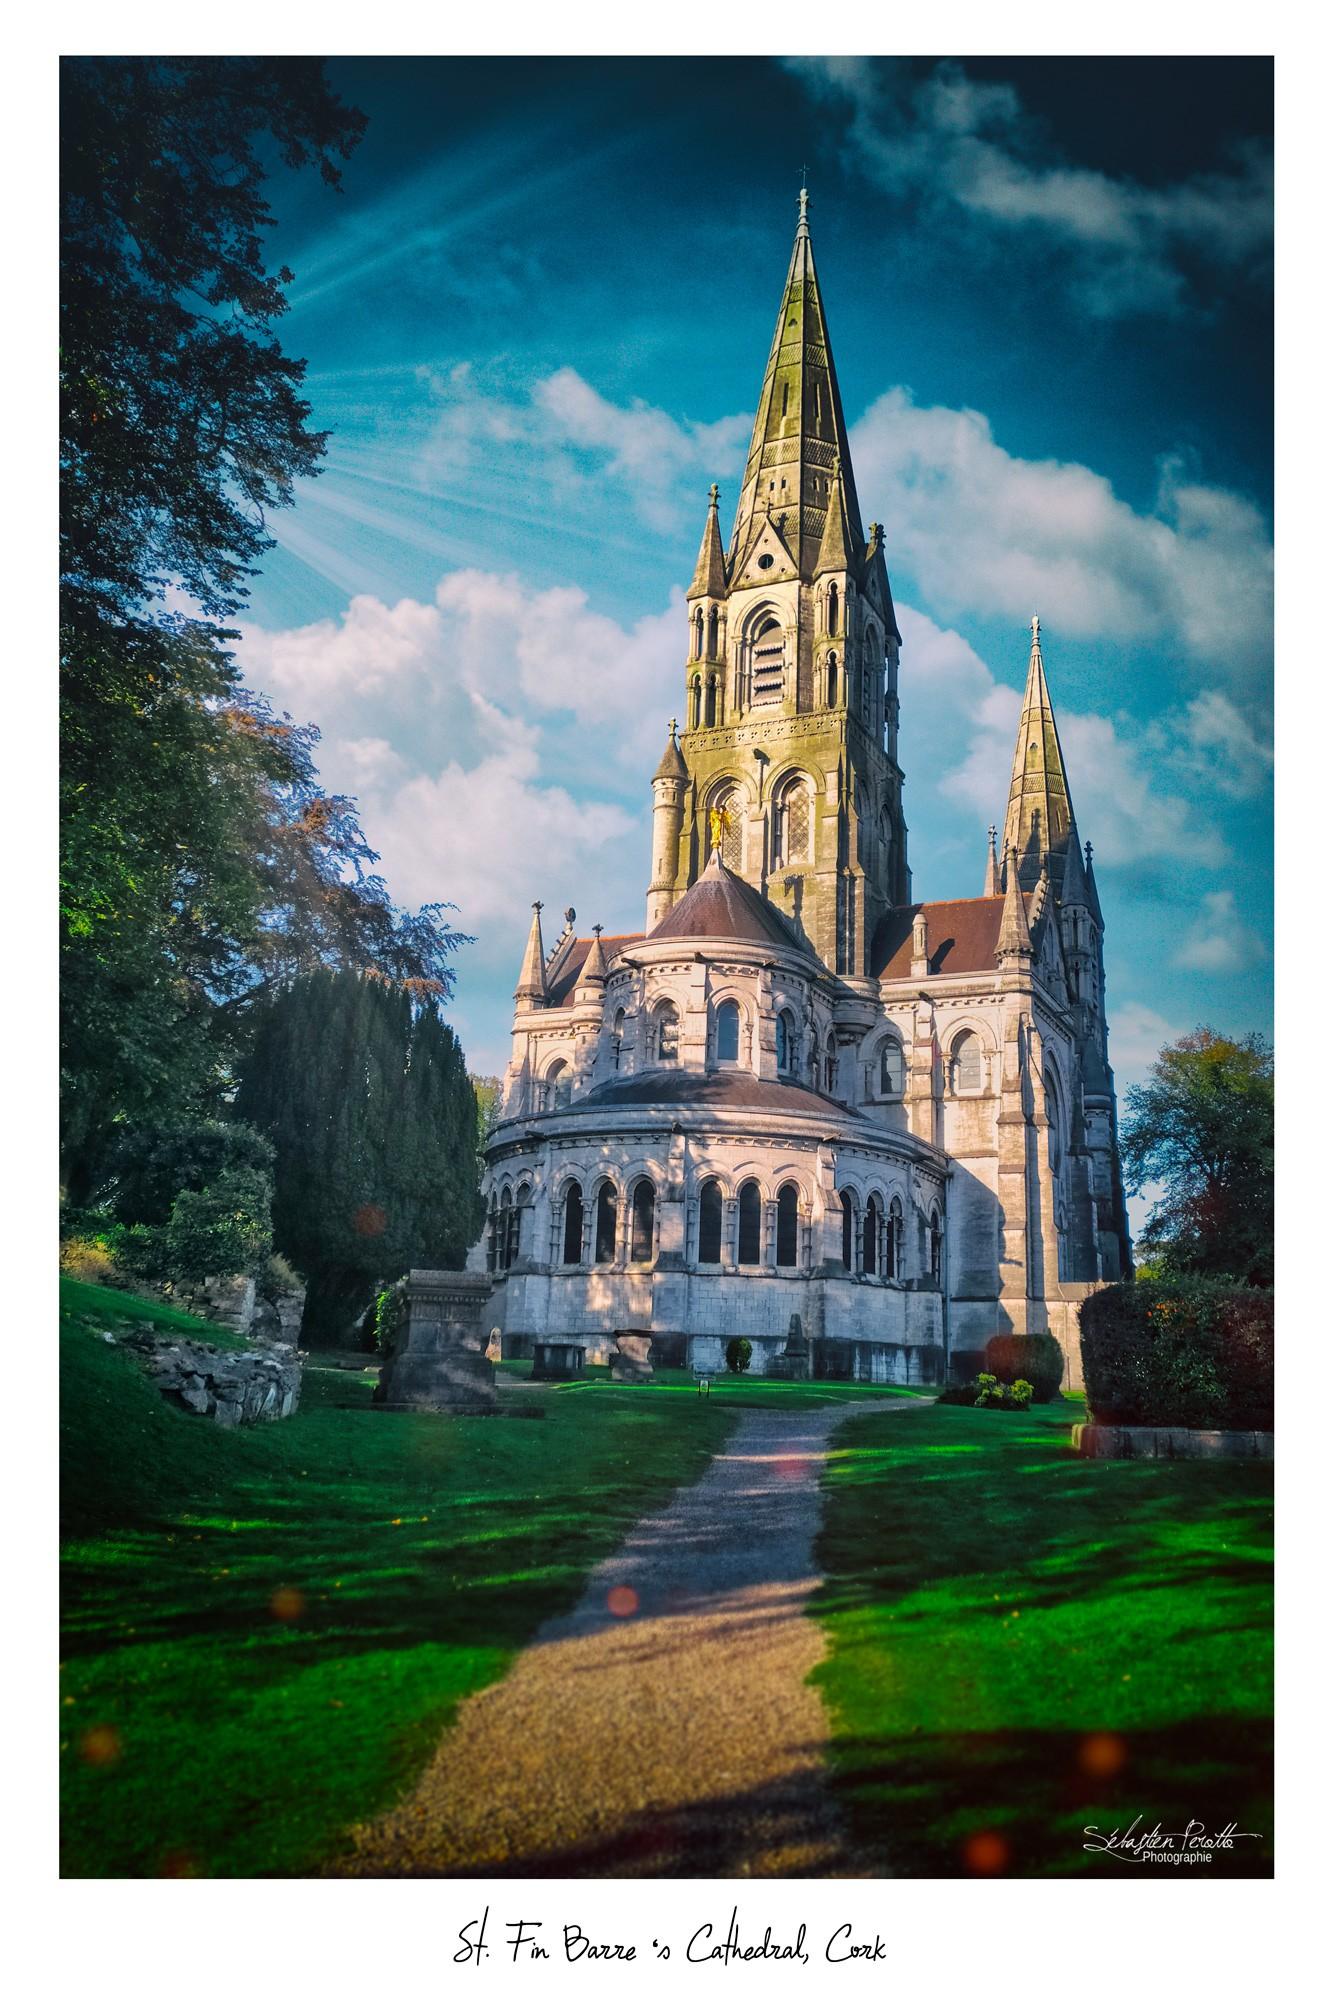 St. Fin Barre's Cathedral - Irish Republic